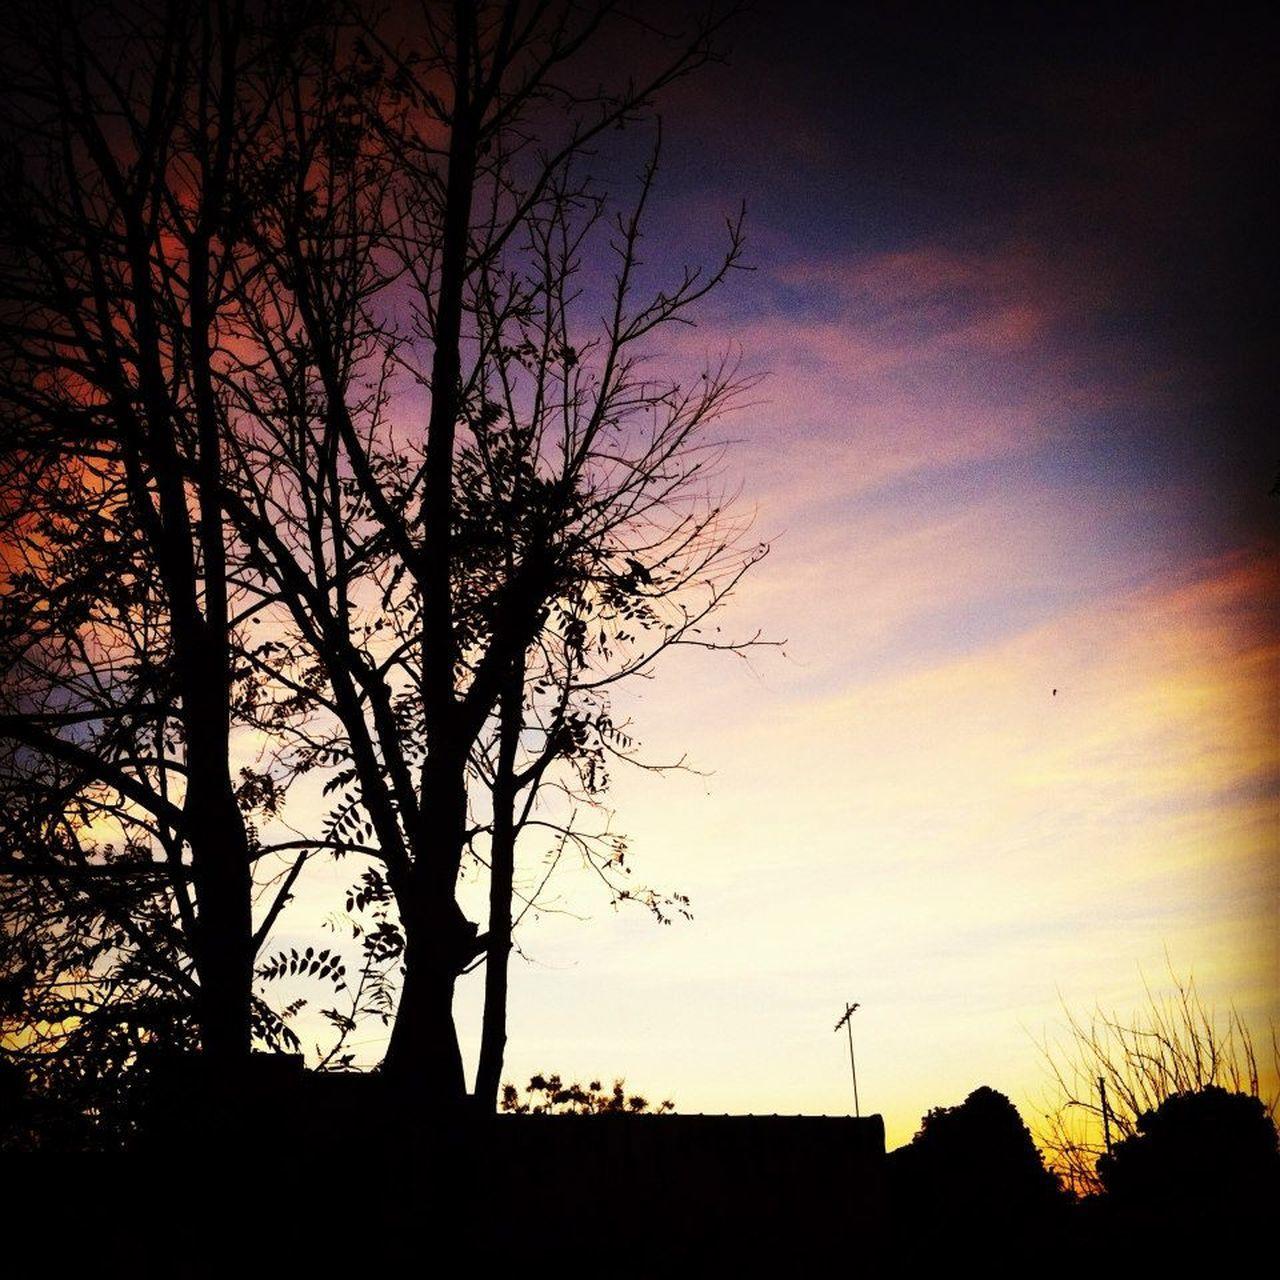 SILHOUETTE TREES ON LANDSCAPE AGAINST SUNSET